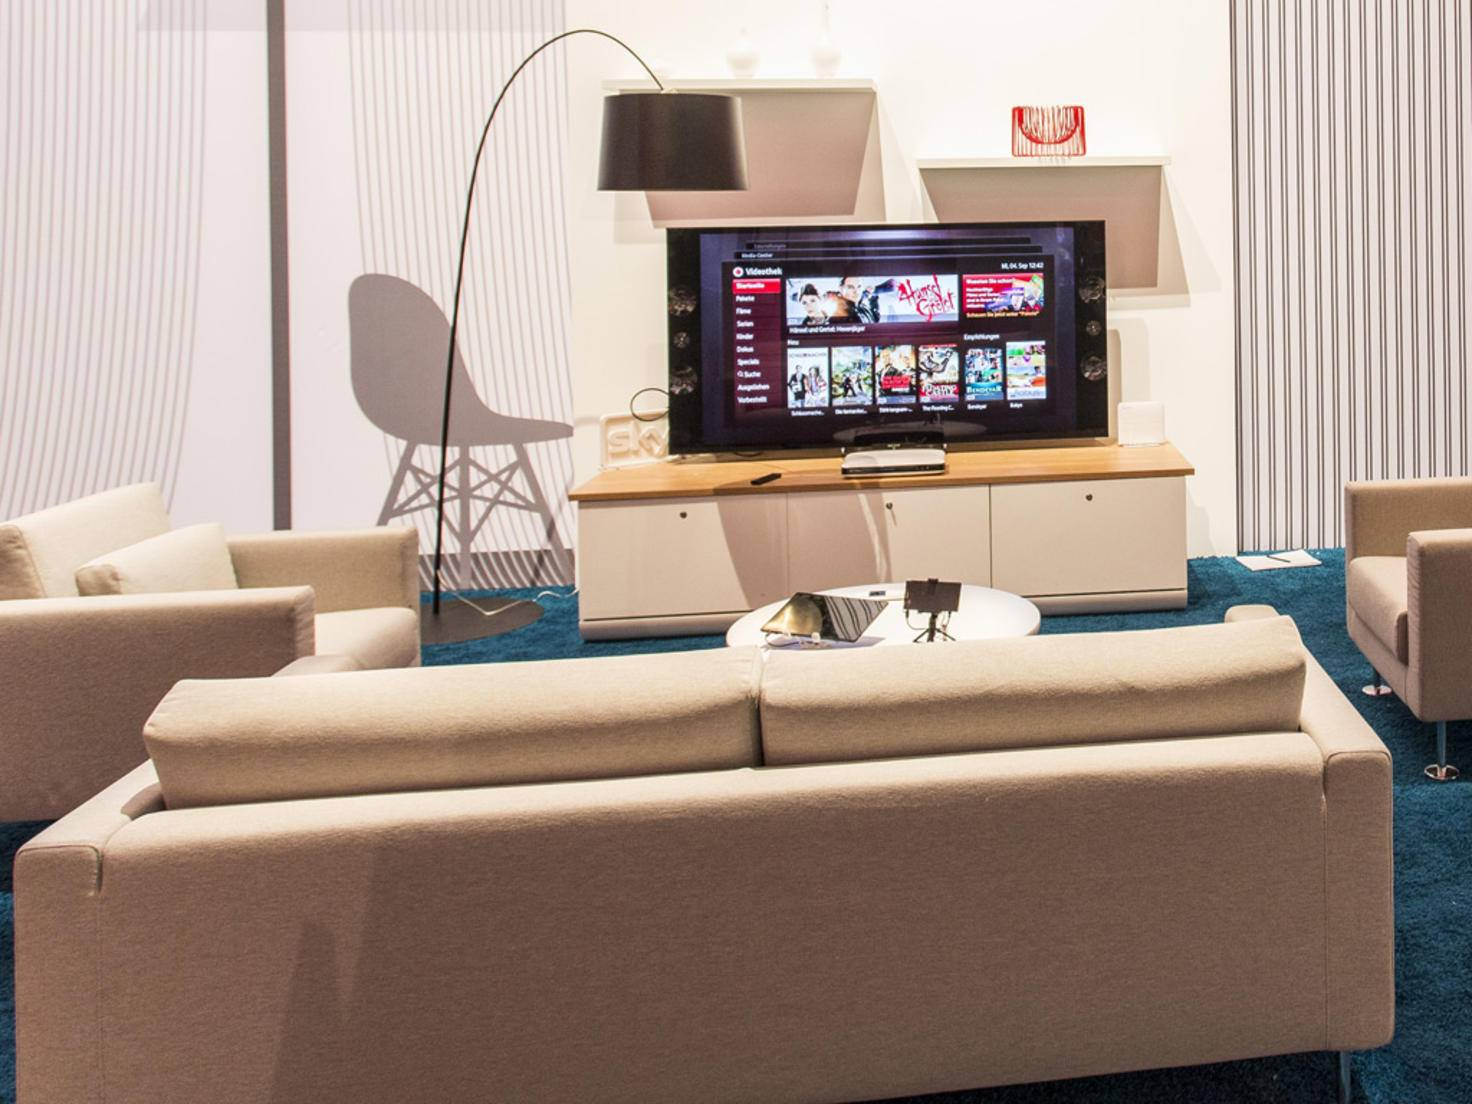 Vodafone-TV-Room